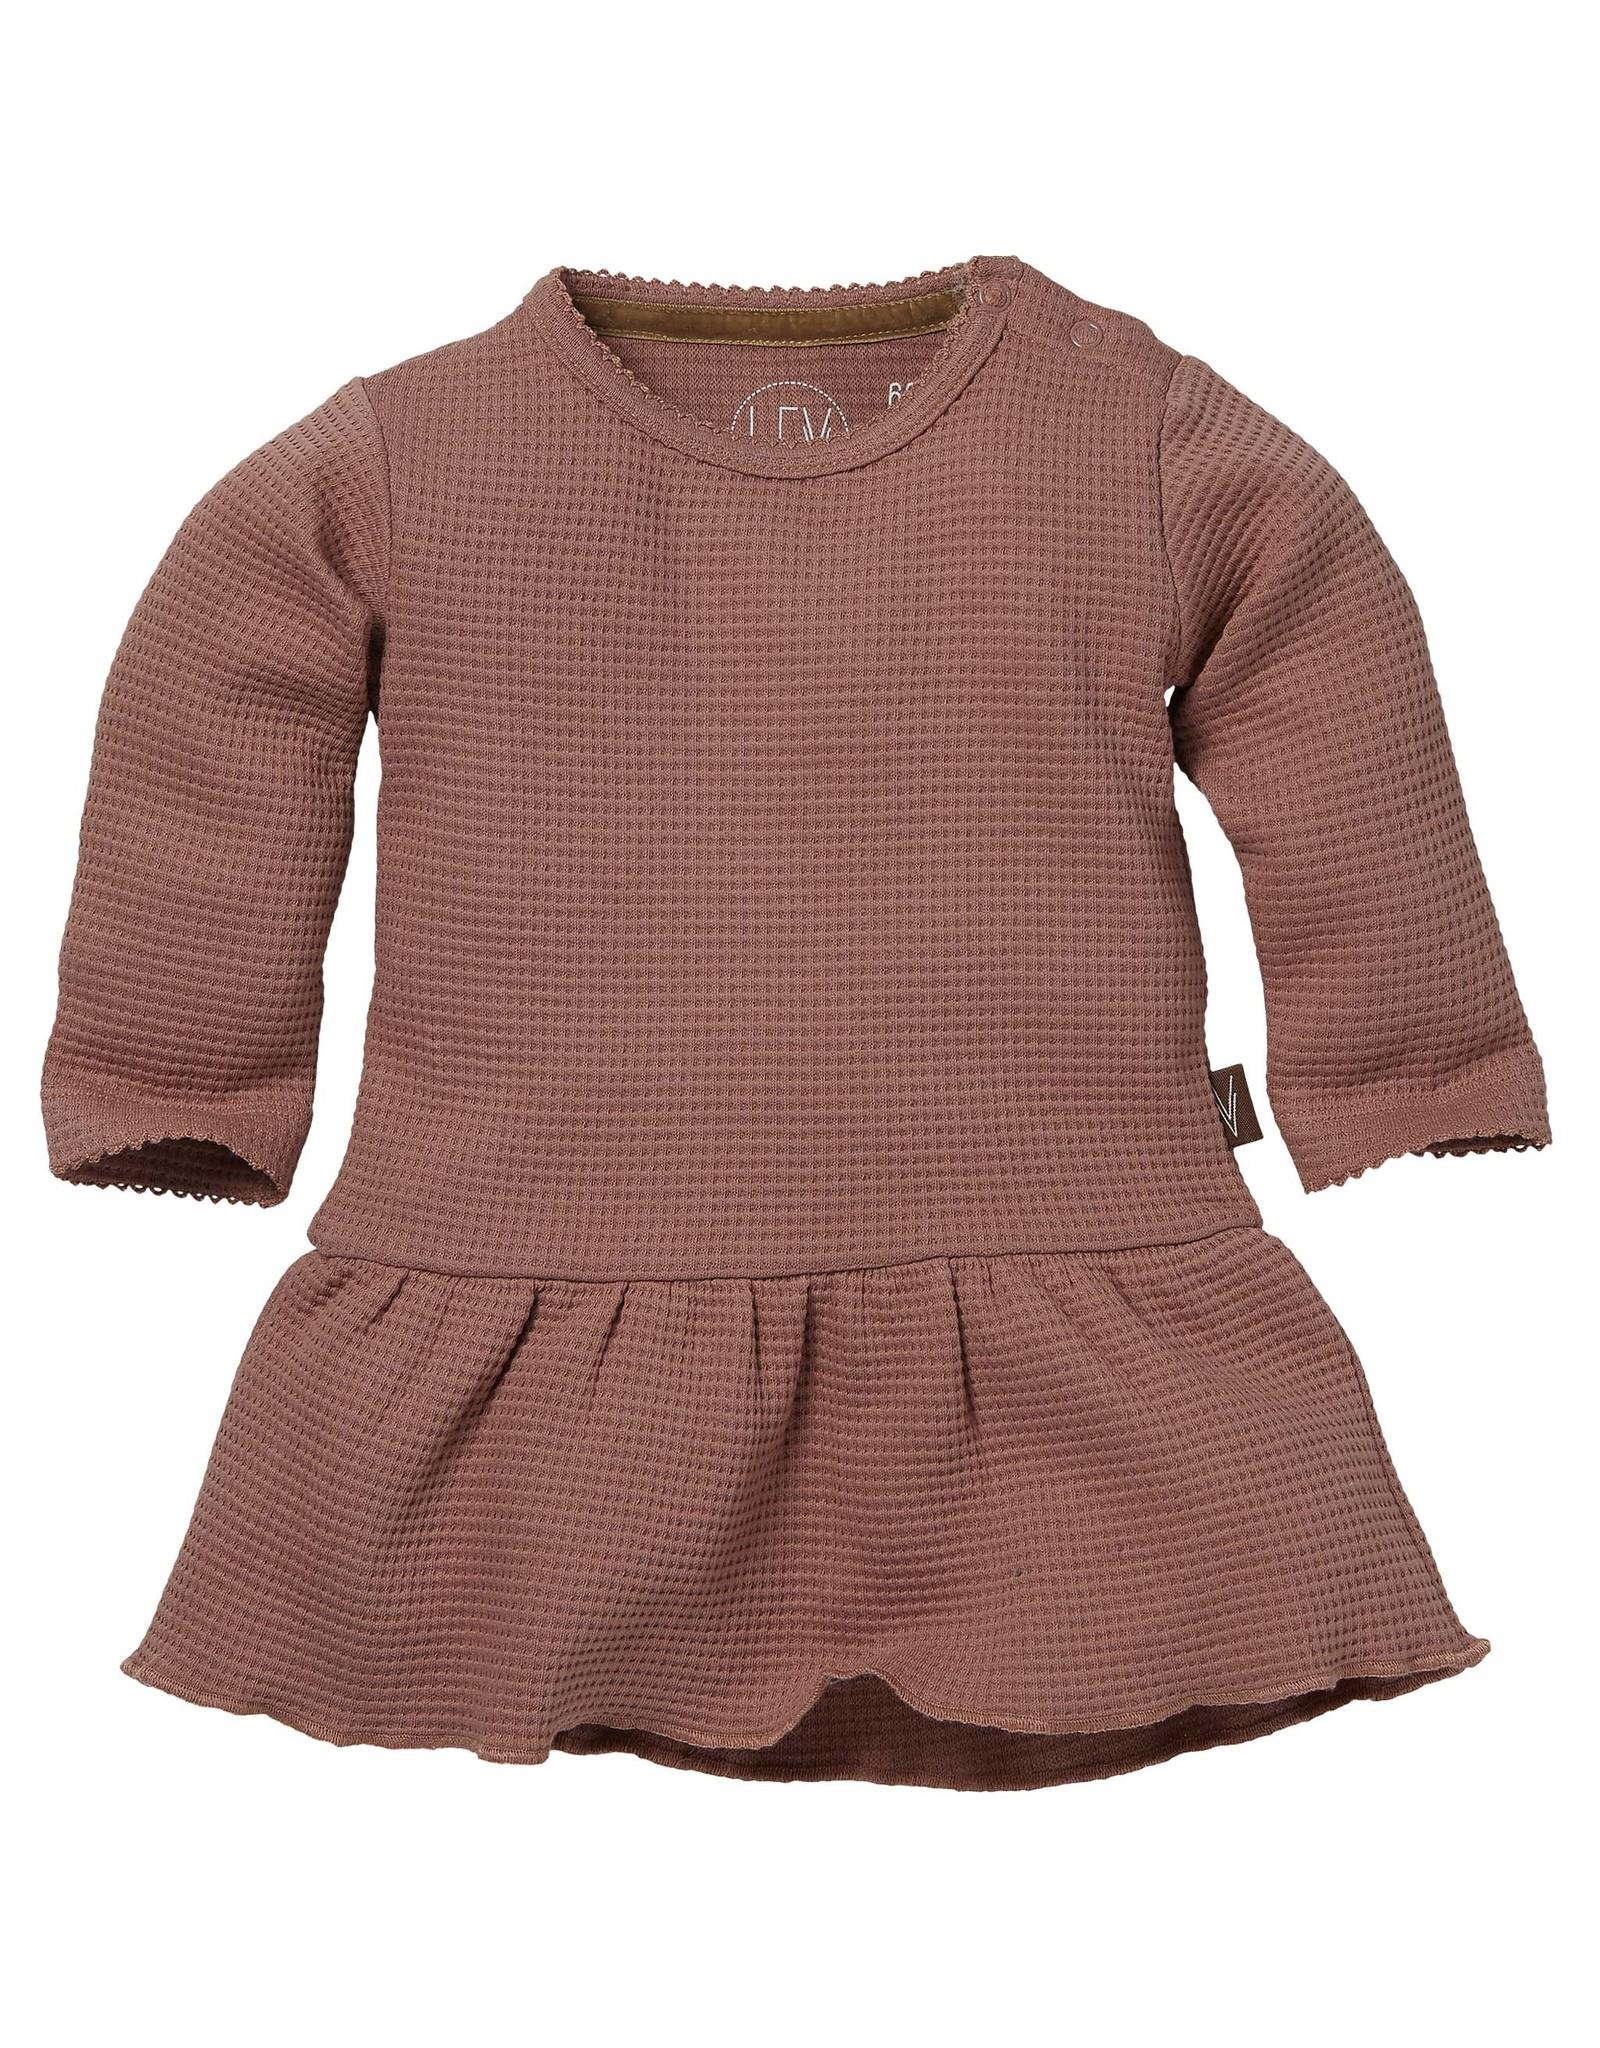 LEVV Levv newborn baby meisjes jurk Baukje Mauve